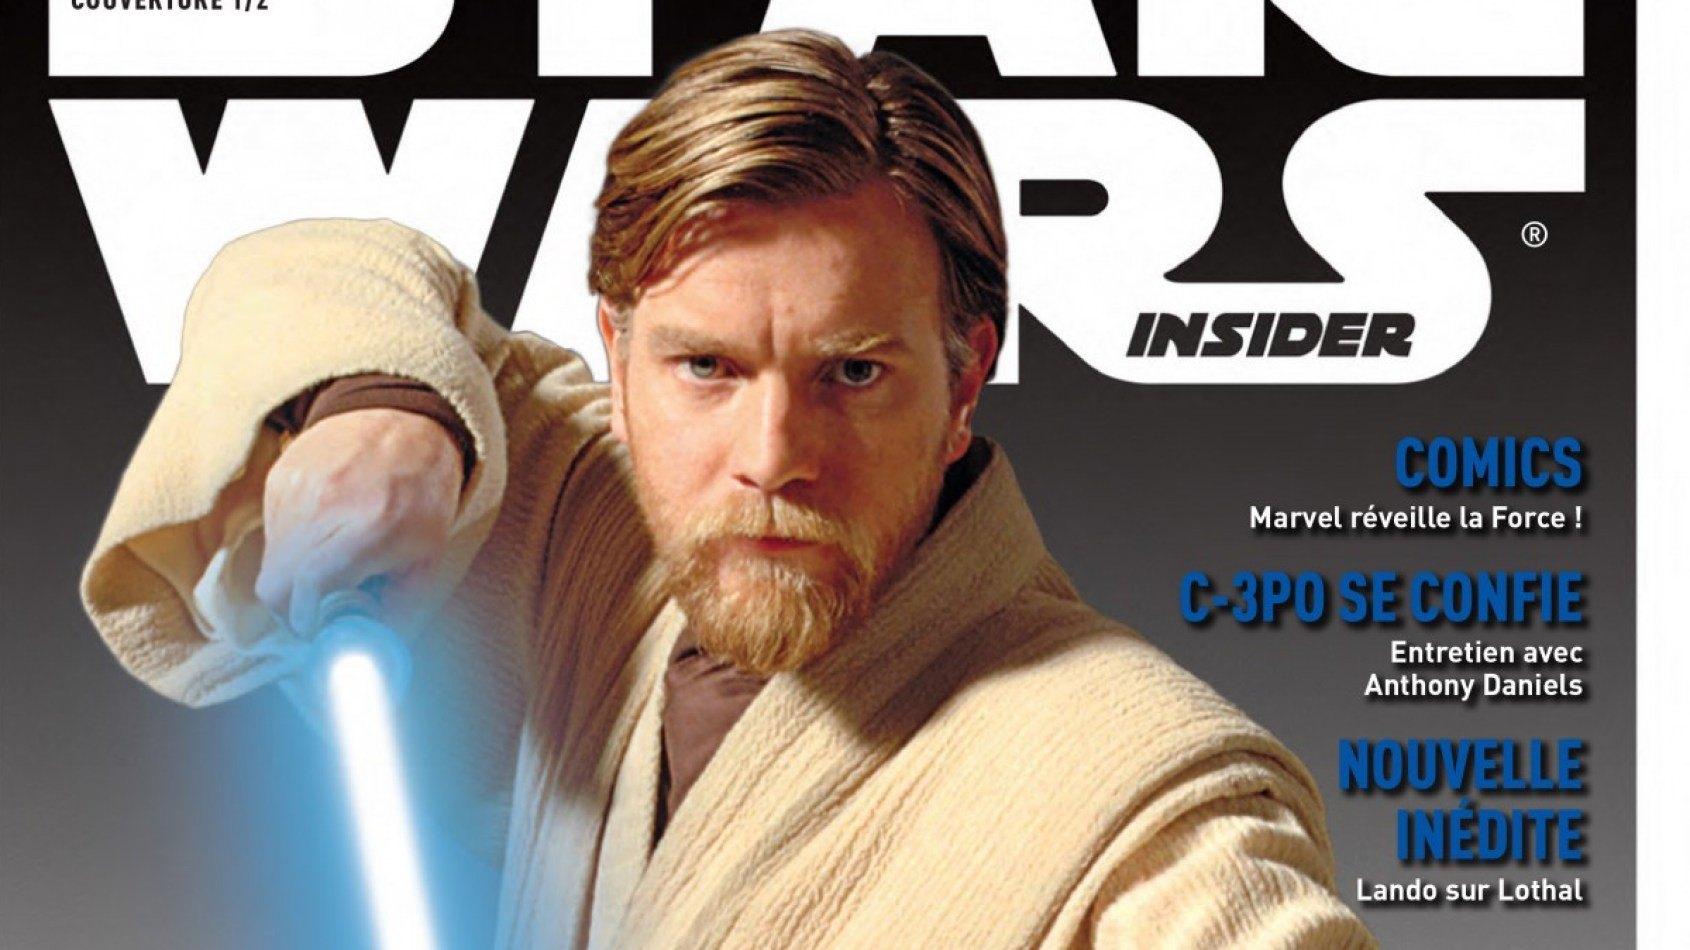 [Panini] Le Star Wars Insider 3 est en kiosque